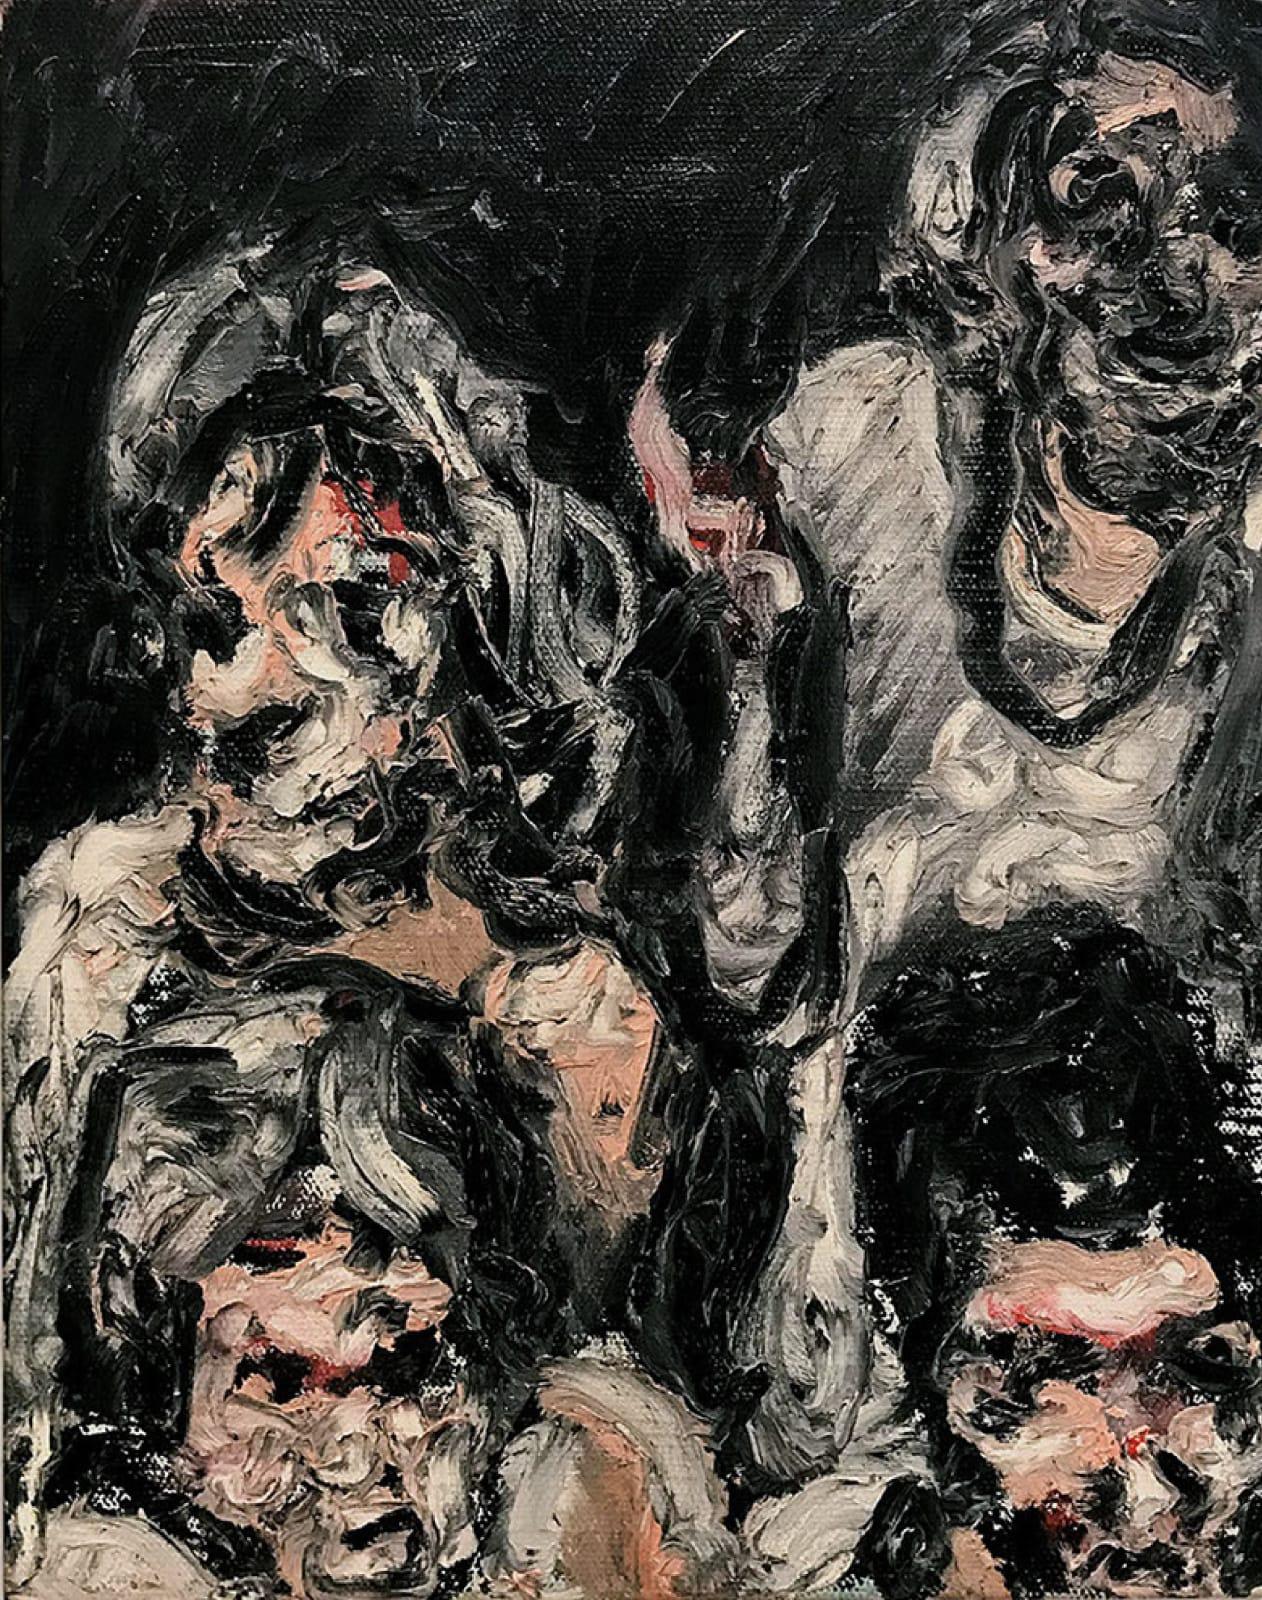 Gustavo Fernandes, Untitled, 2018